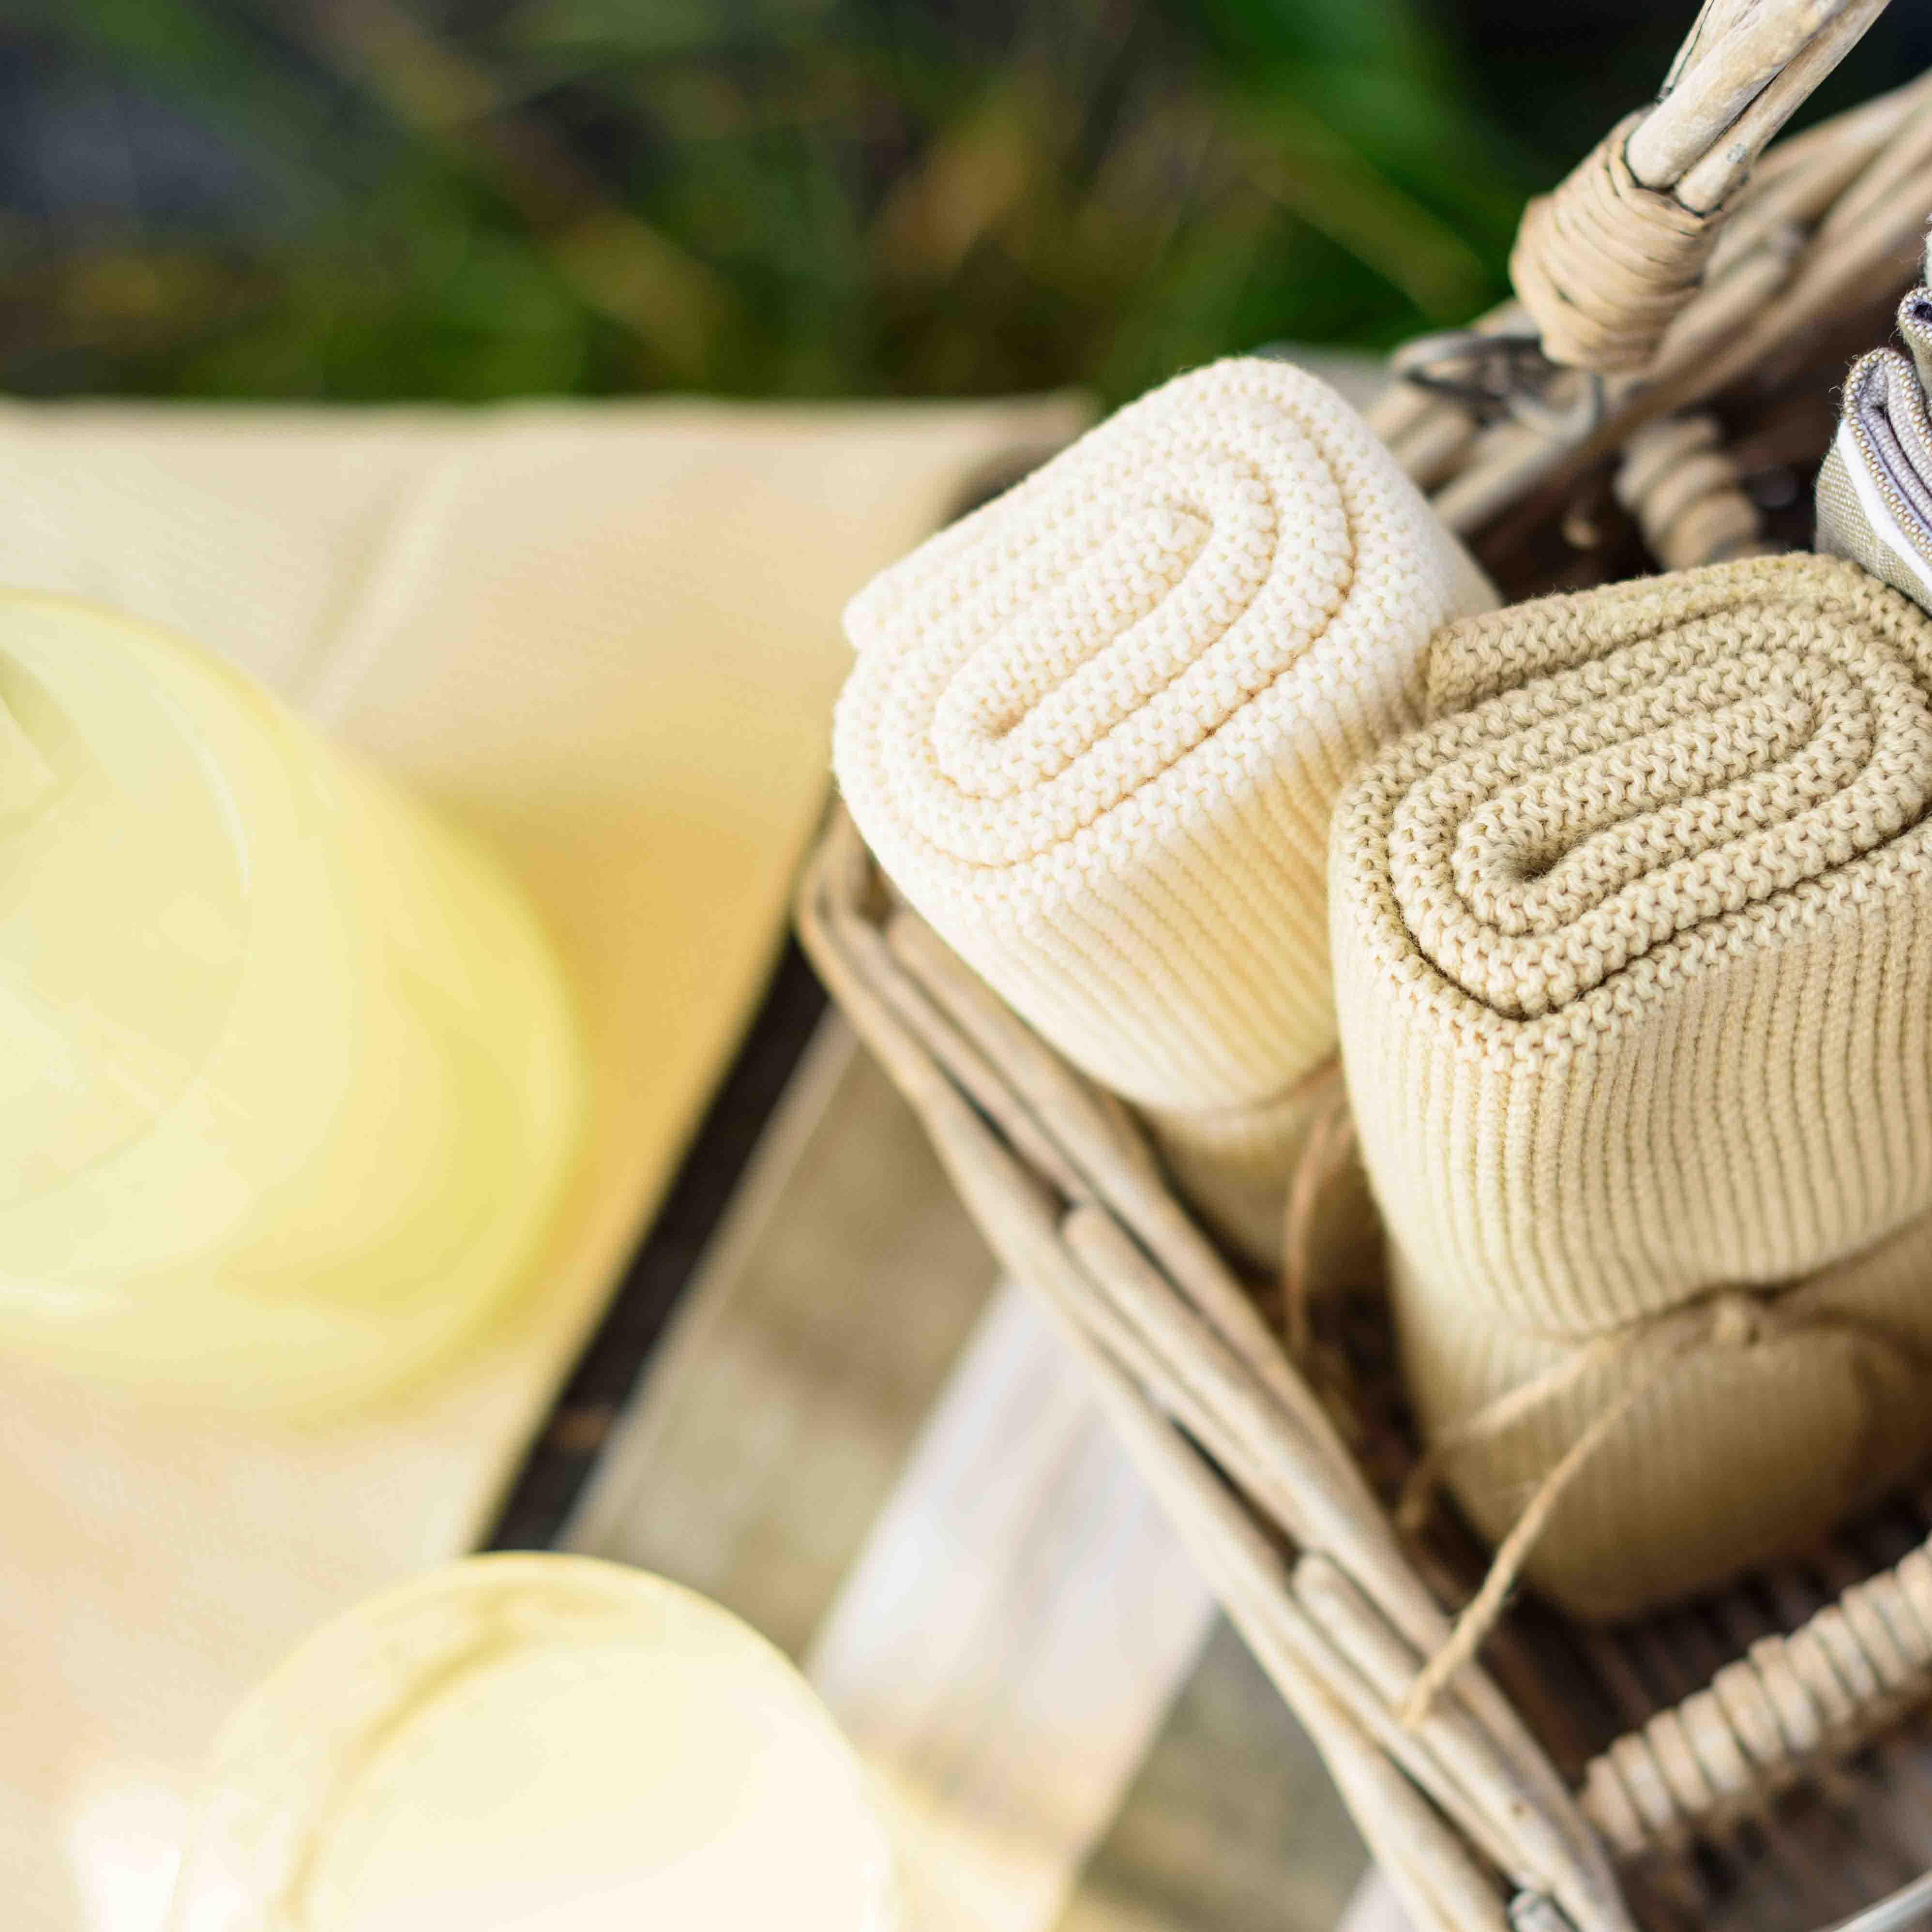 Solwang Handtuch